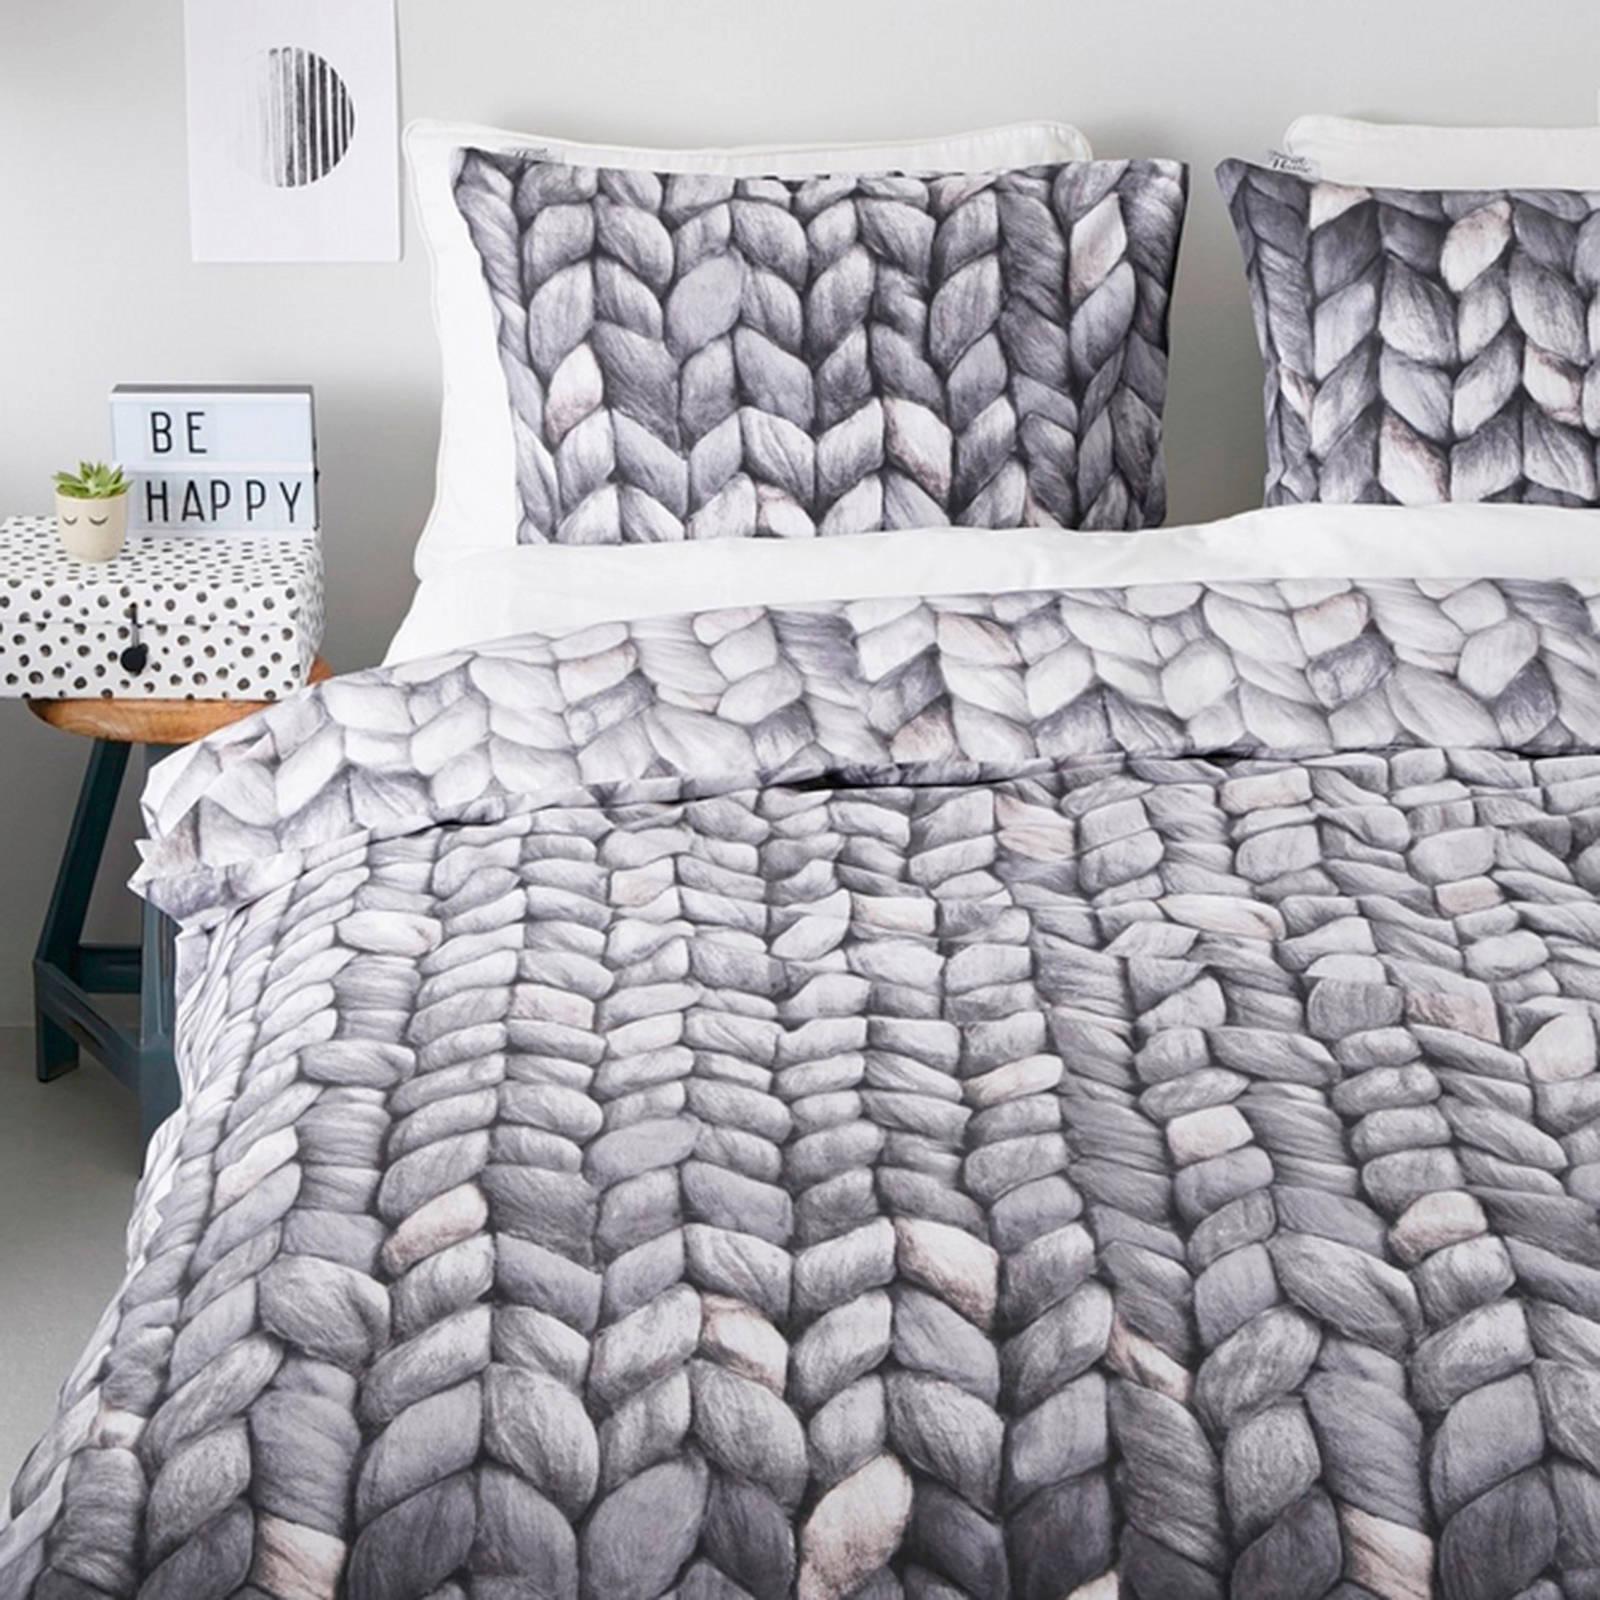 ariadne at home katoenen dekbedovertrek lits jumeaux grijs